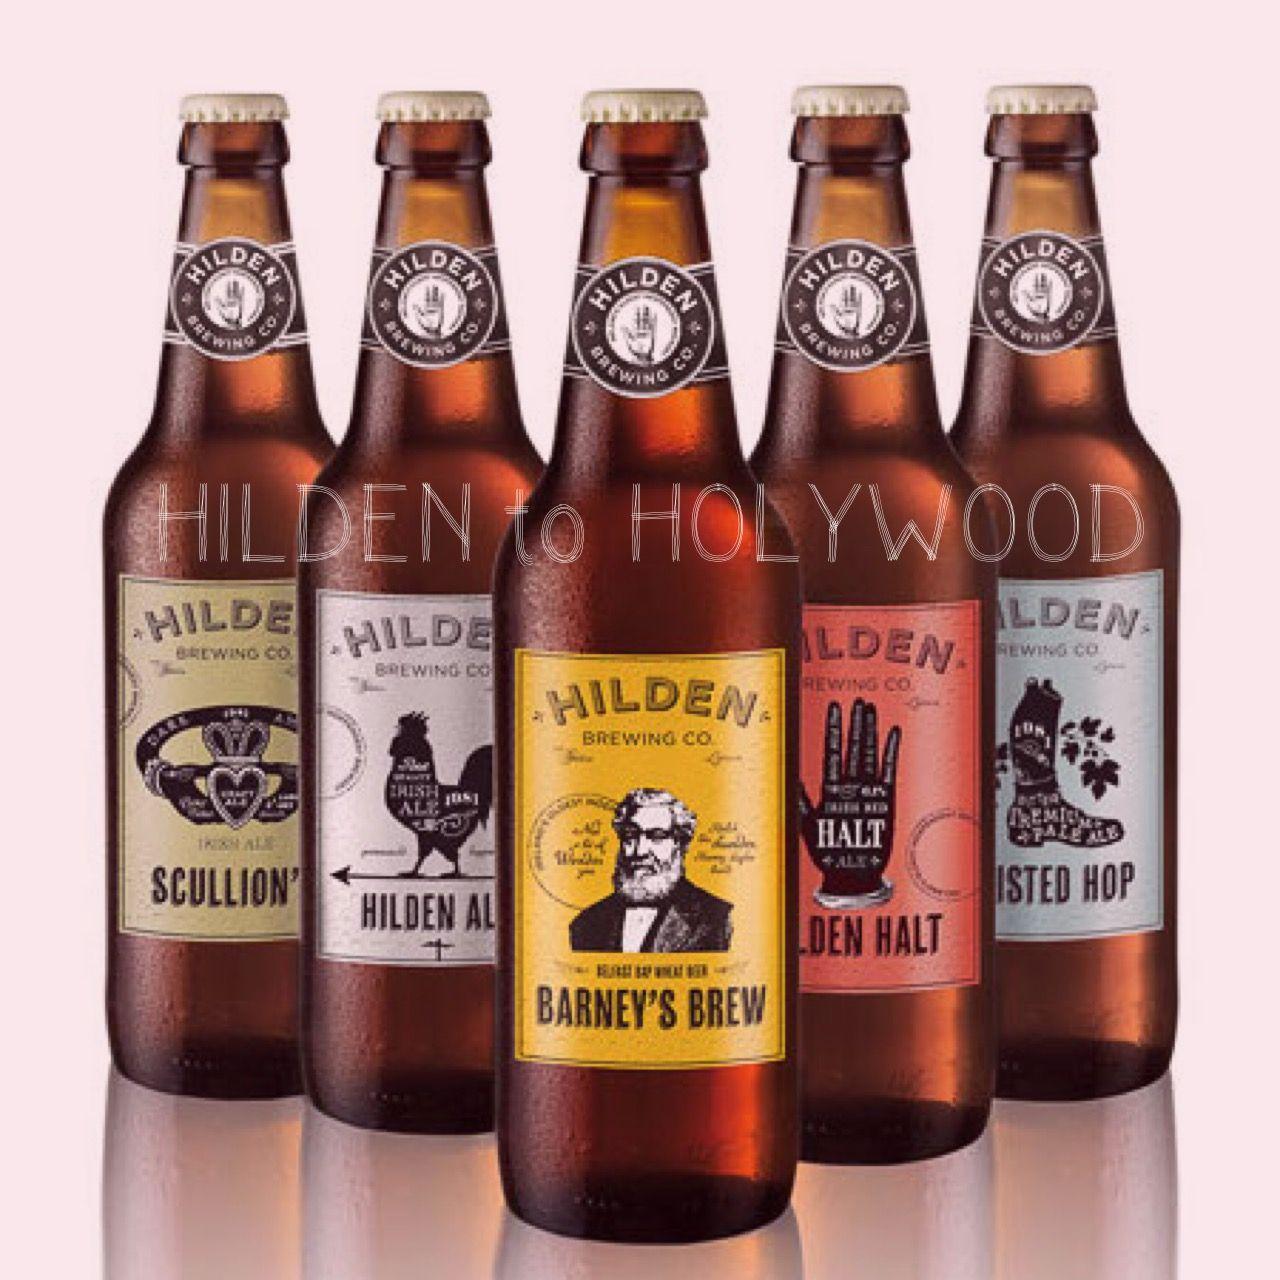 Pin By Markus Aurelius On Design Packaging Beer Bottle Design Beer Design Beer Packaging Design